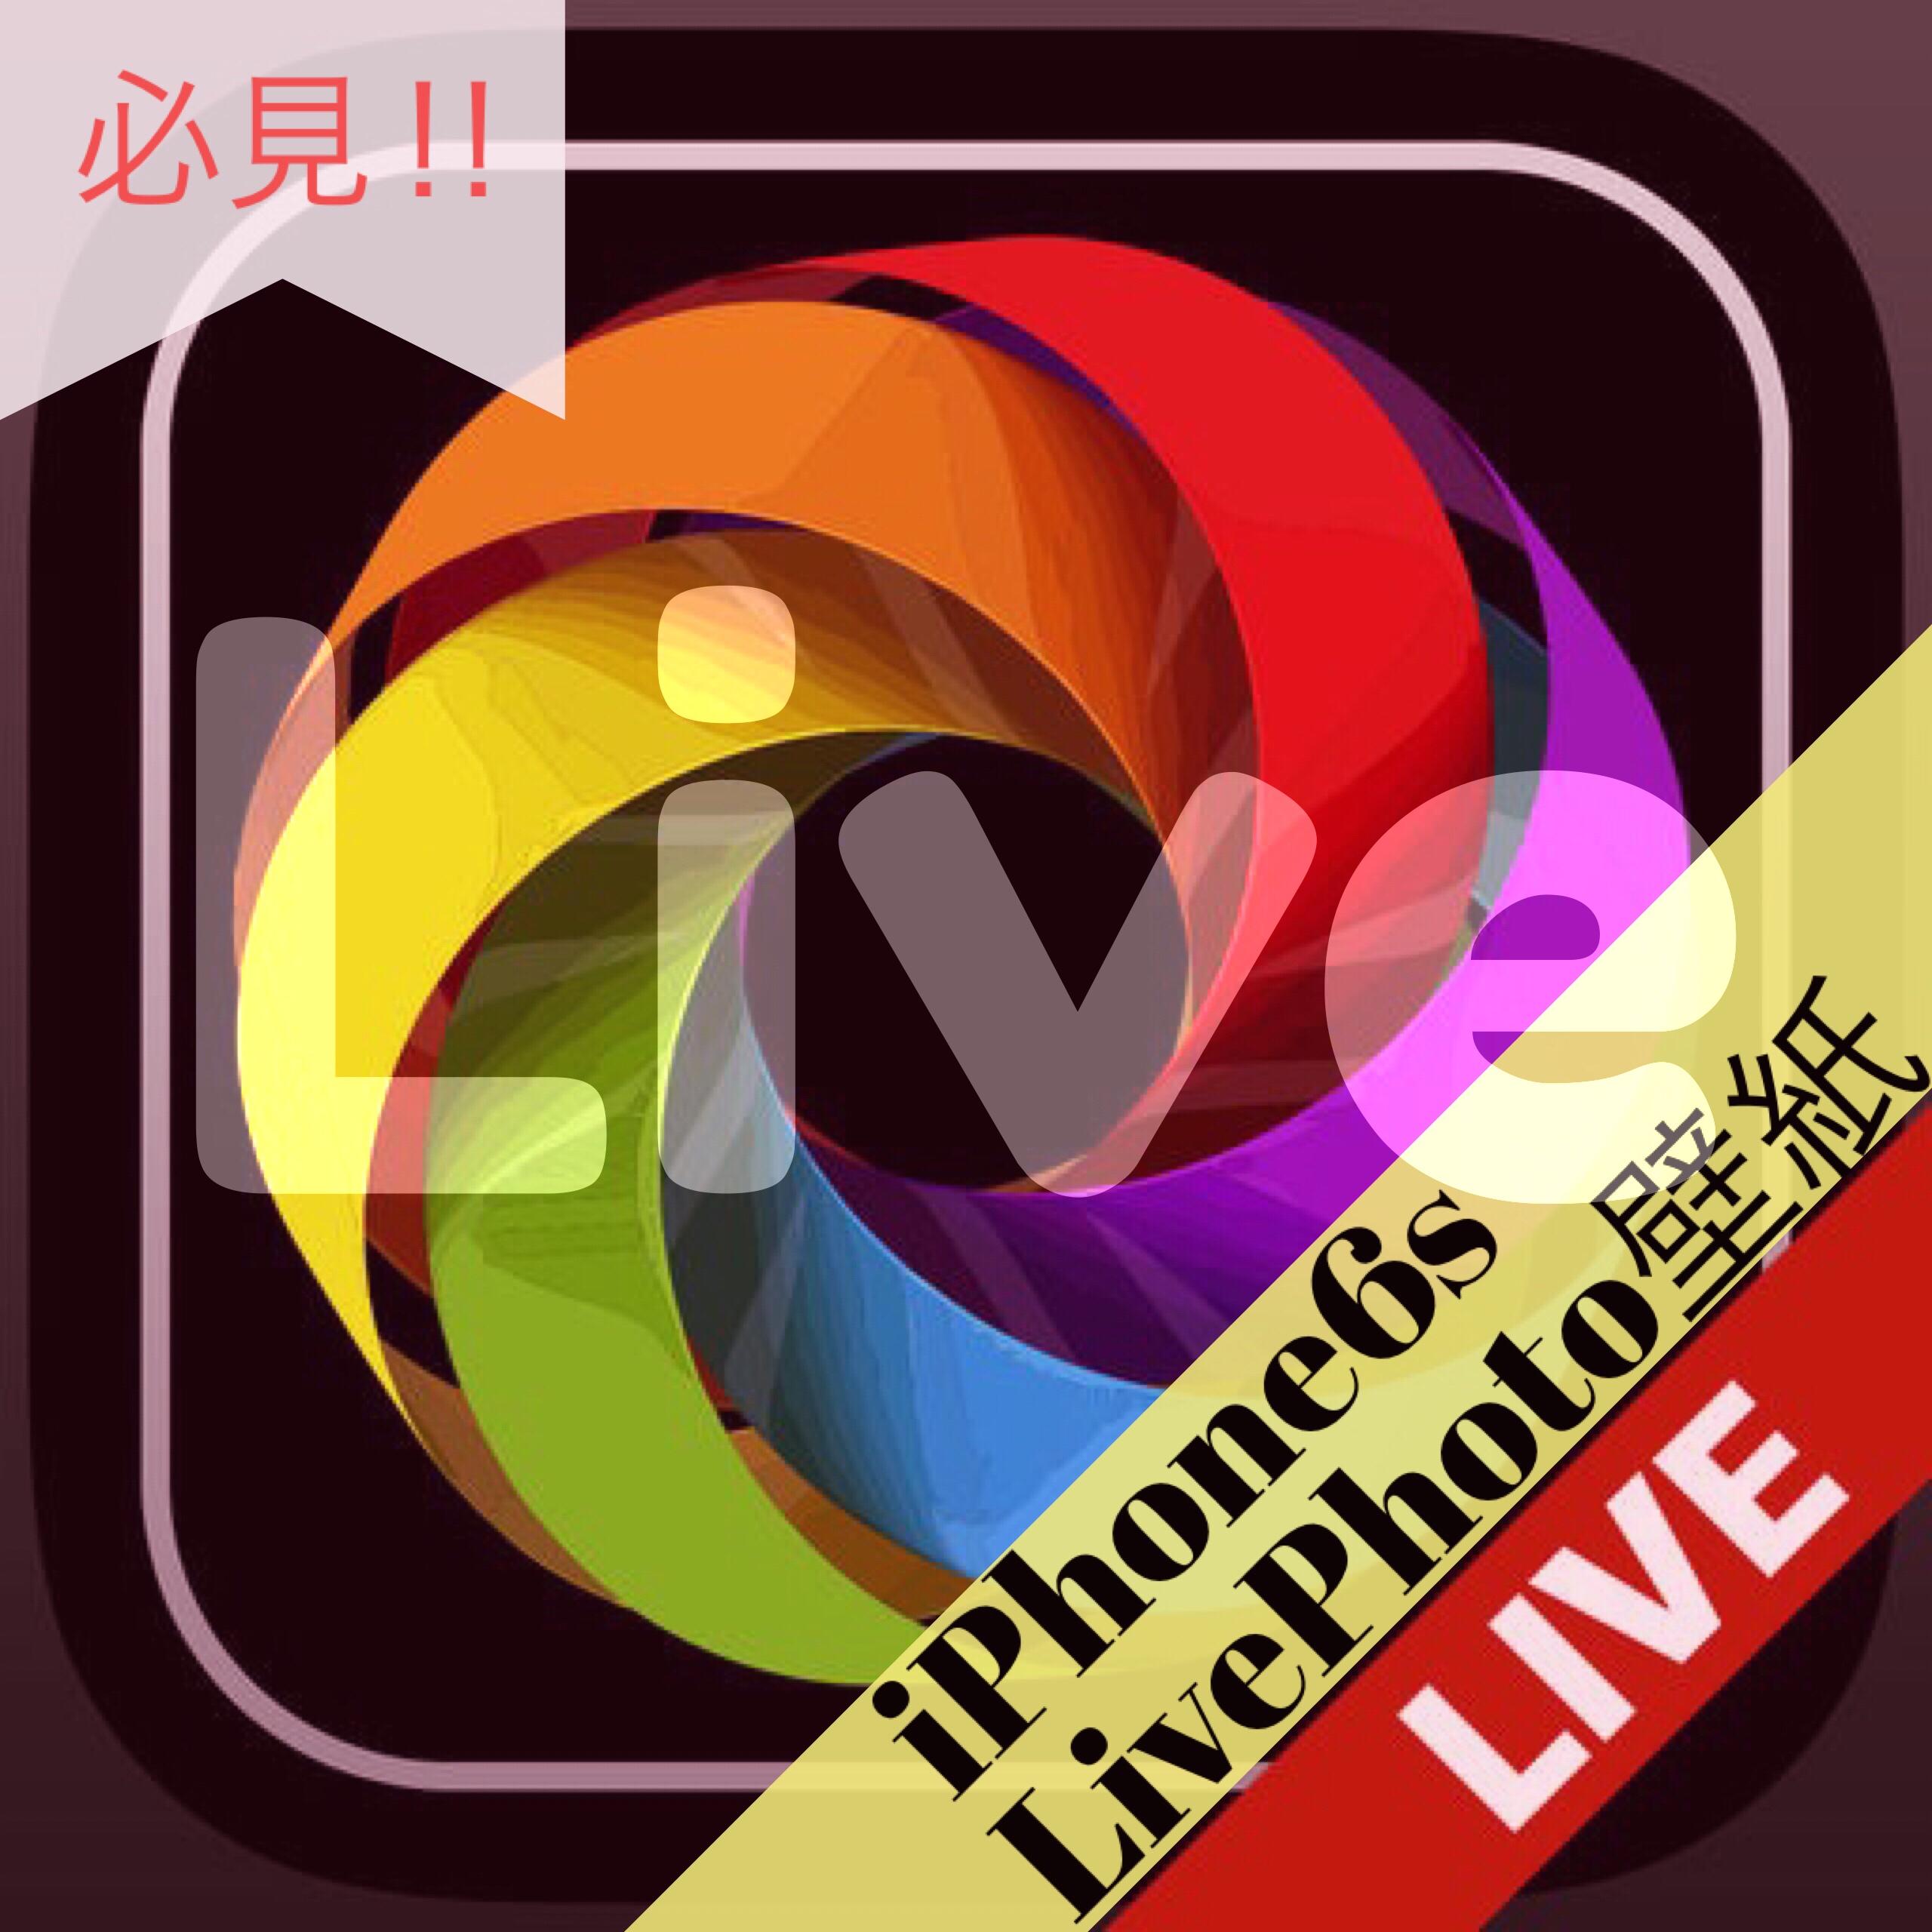 Iphone6sユーザー必見 お洒落なライブフォト壁紙を見つけるアプリ Live Wallpaper Ha Takeden